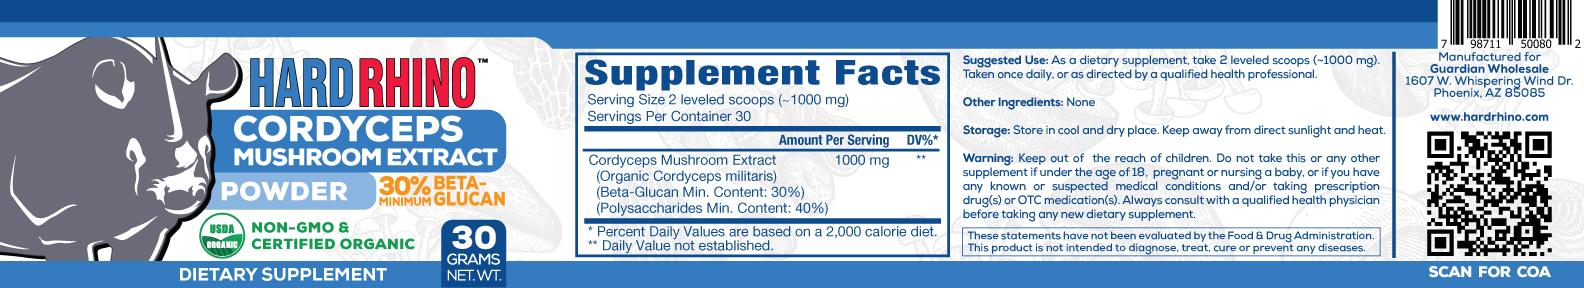 cordyceps-30-gram